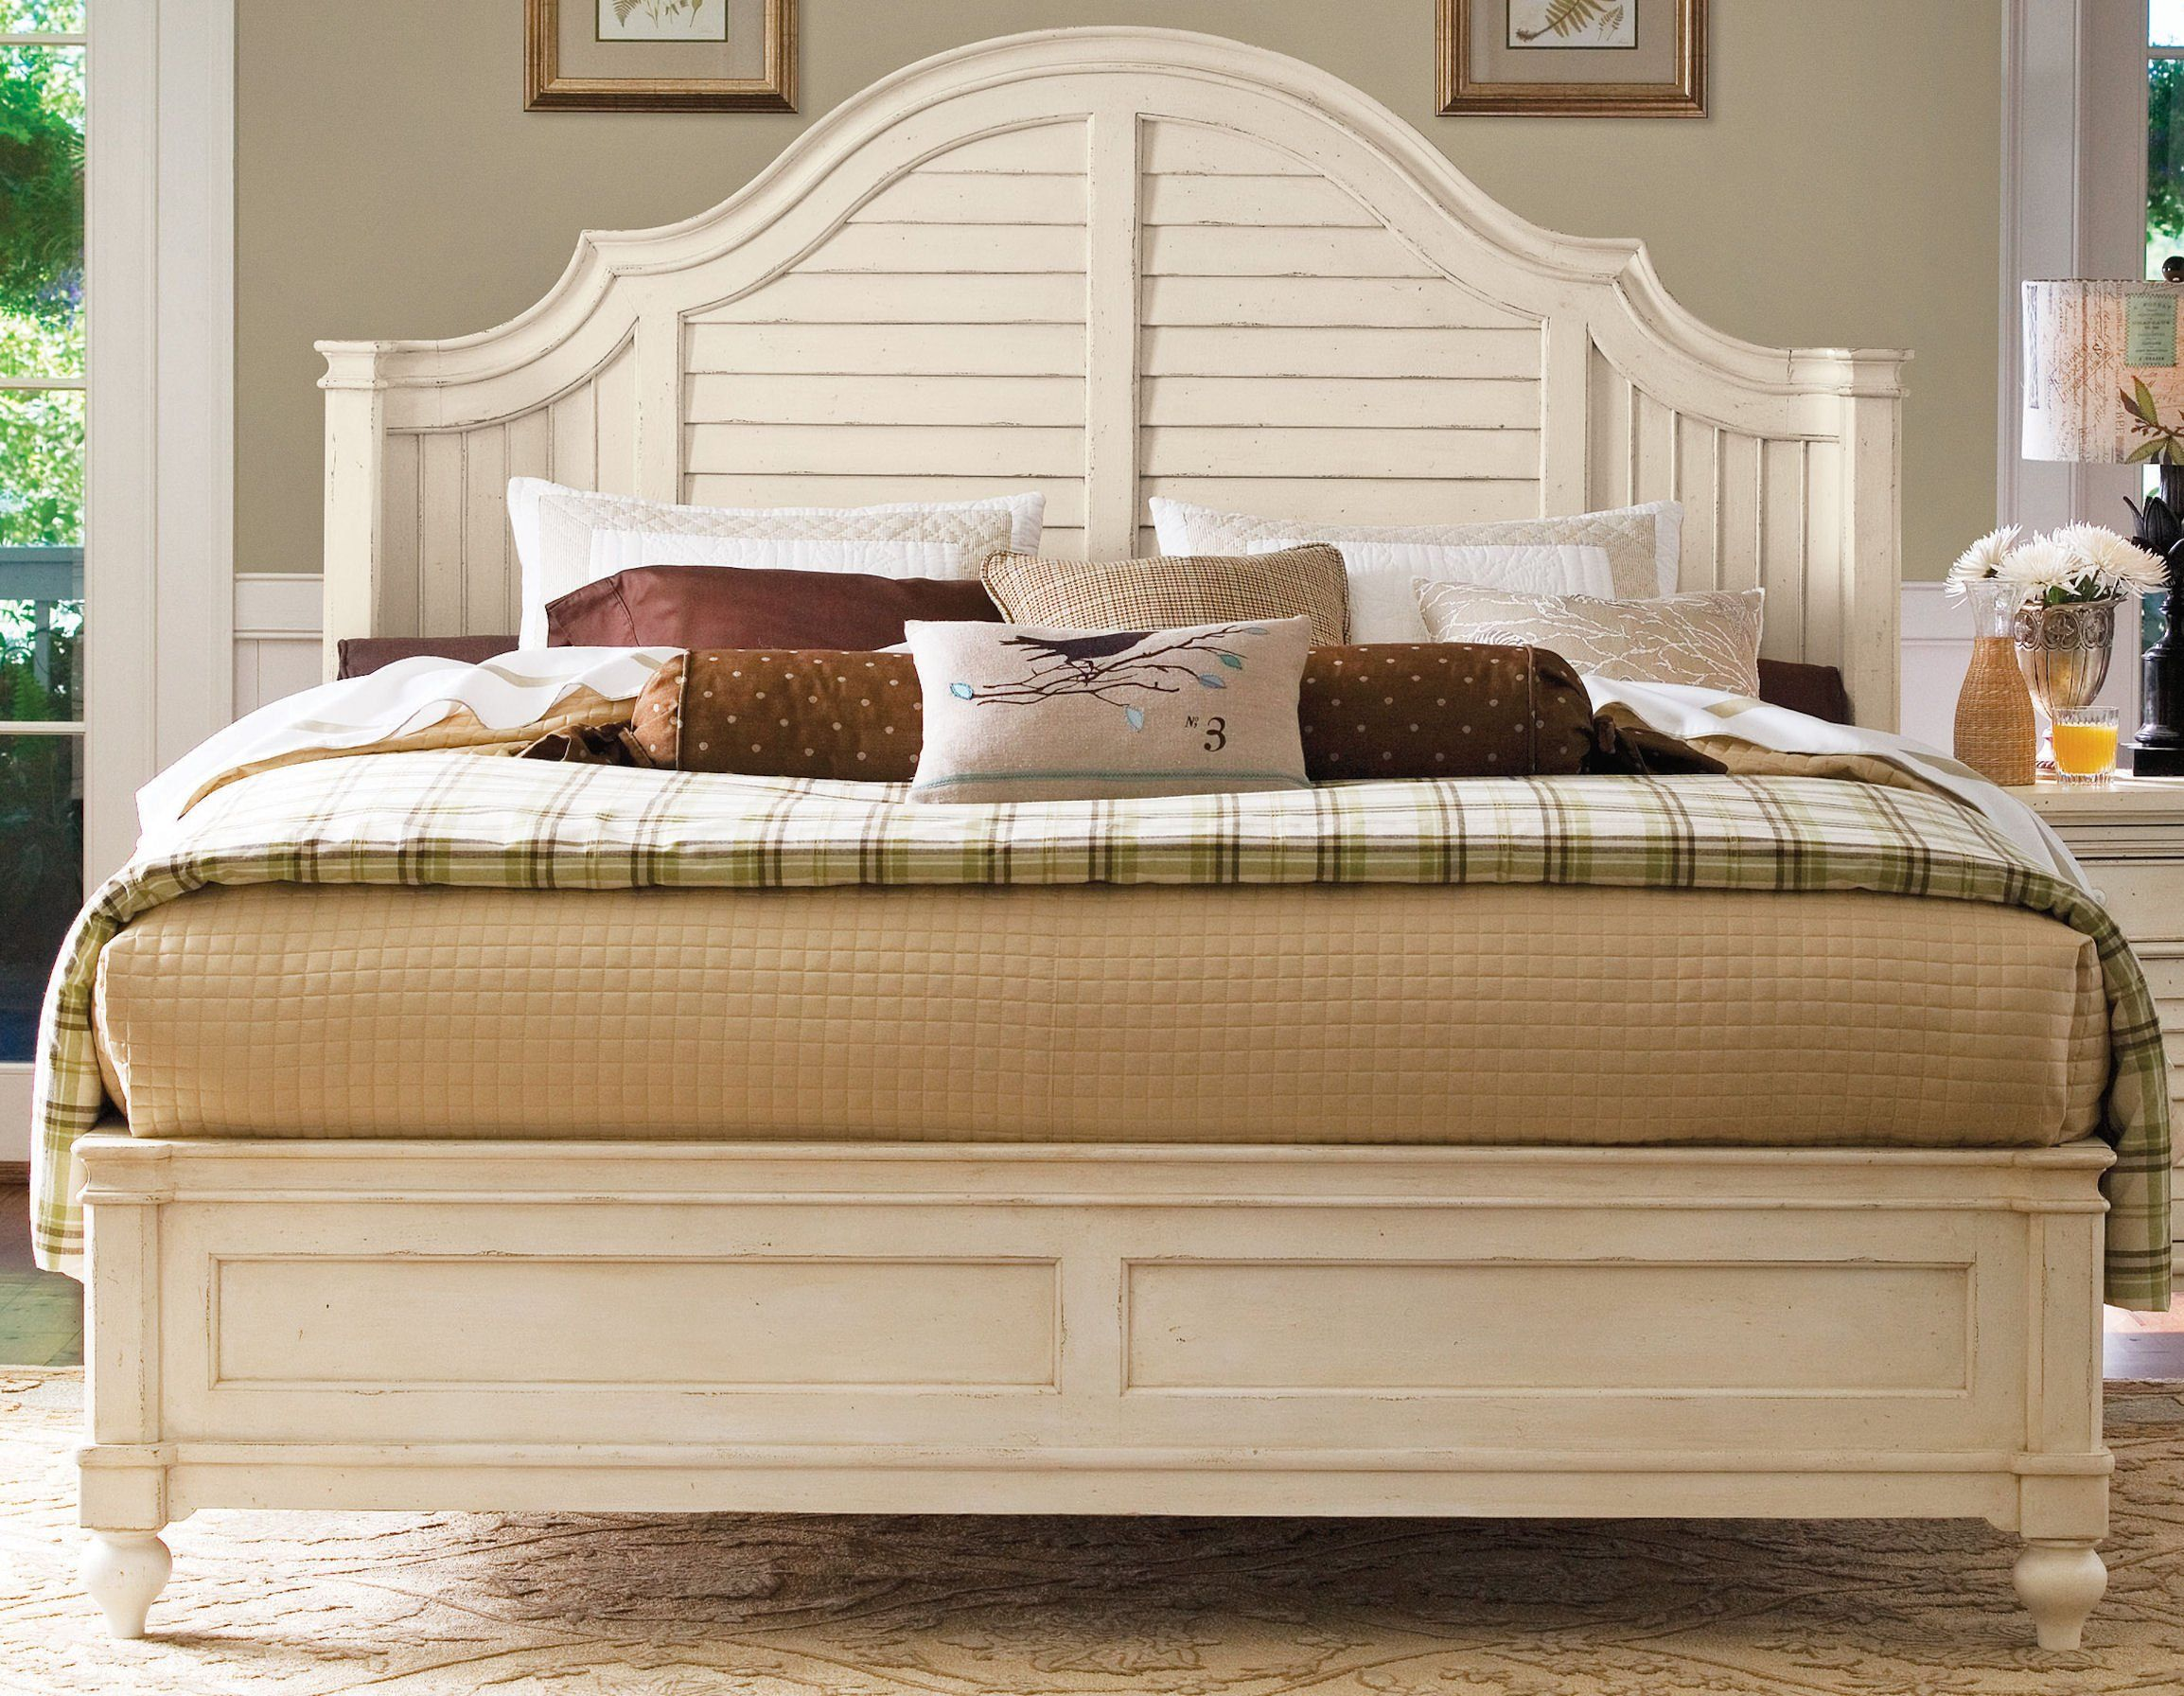 Universal Furniture  Magnolia bed, Paula deen bedroom furniture